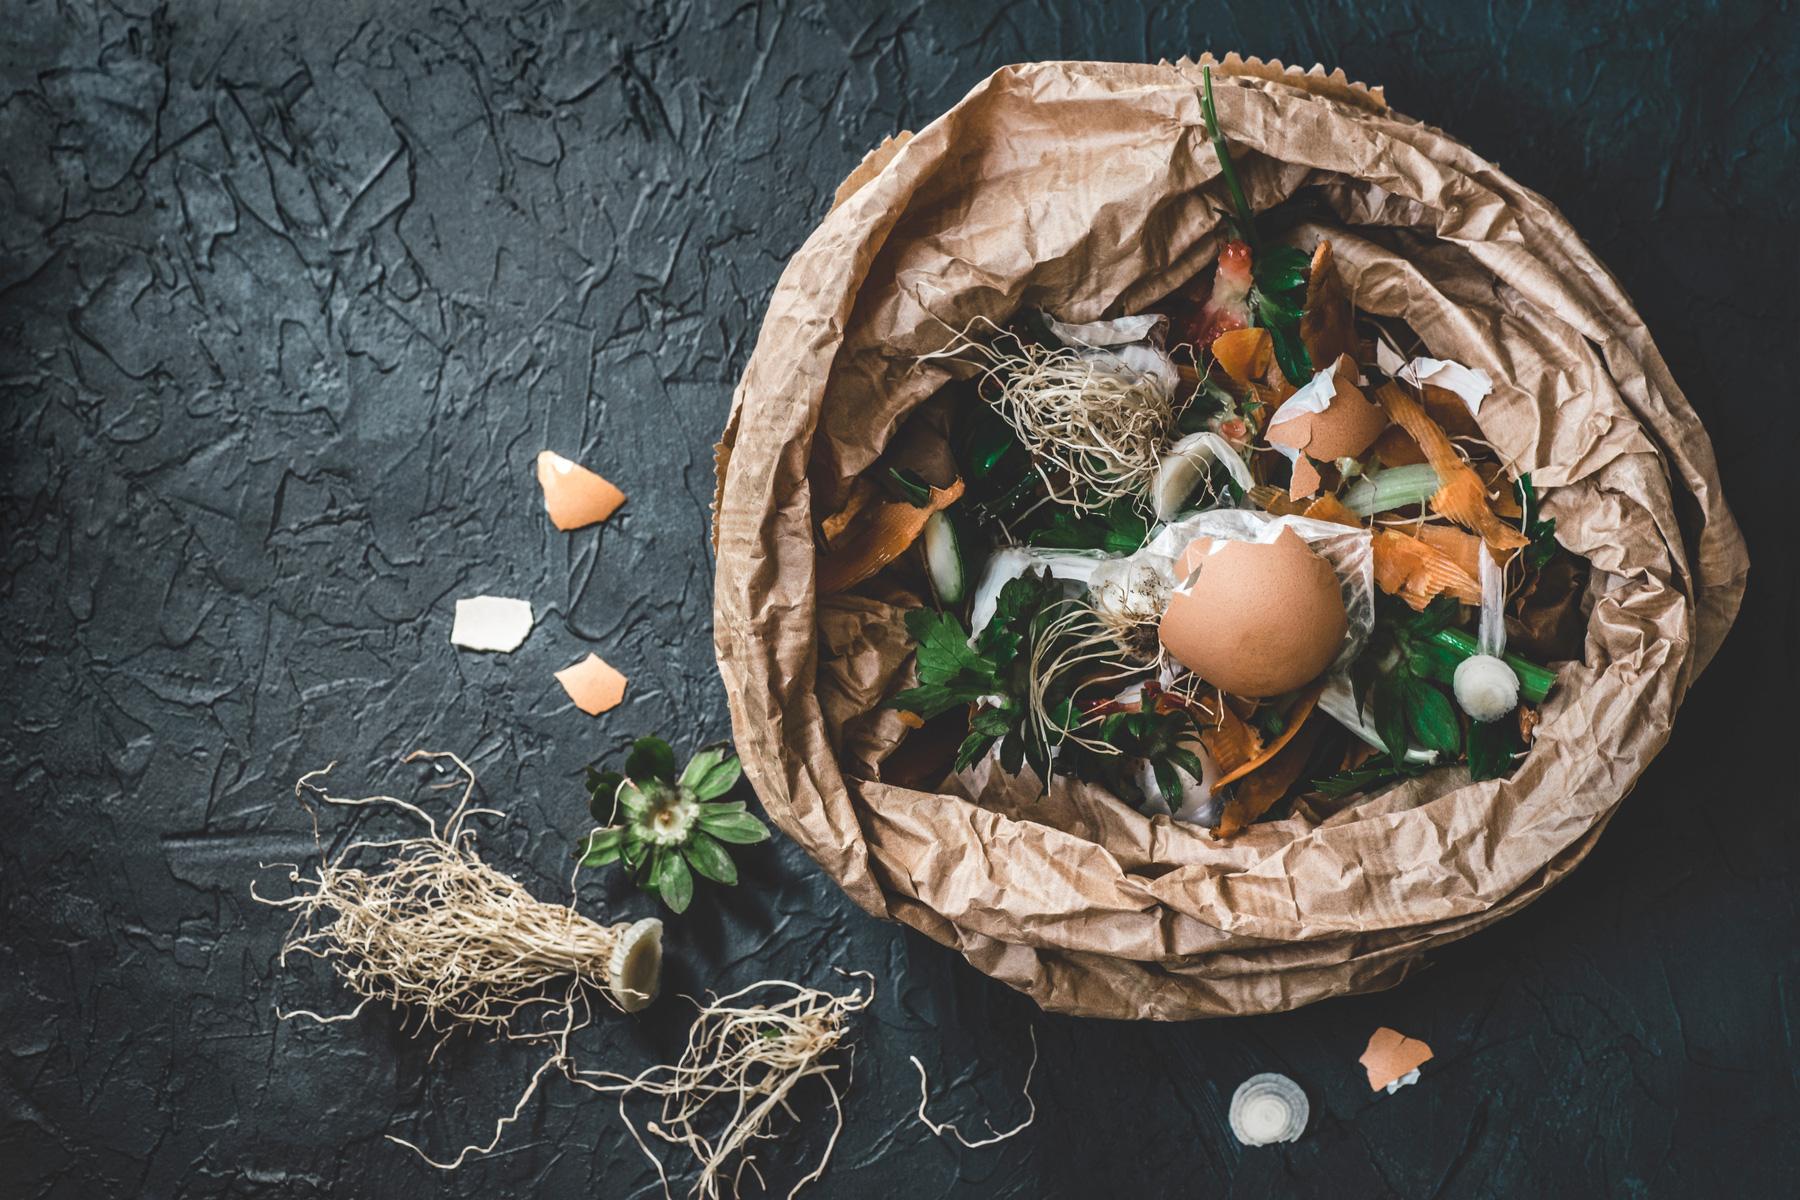 Swiss food composting